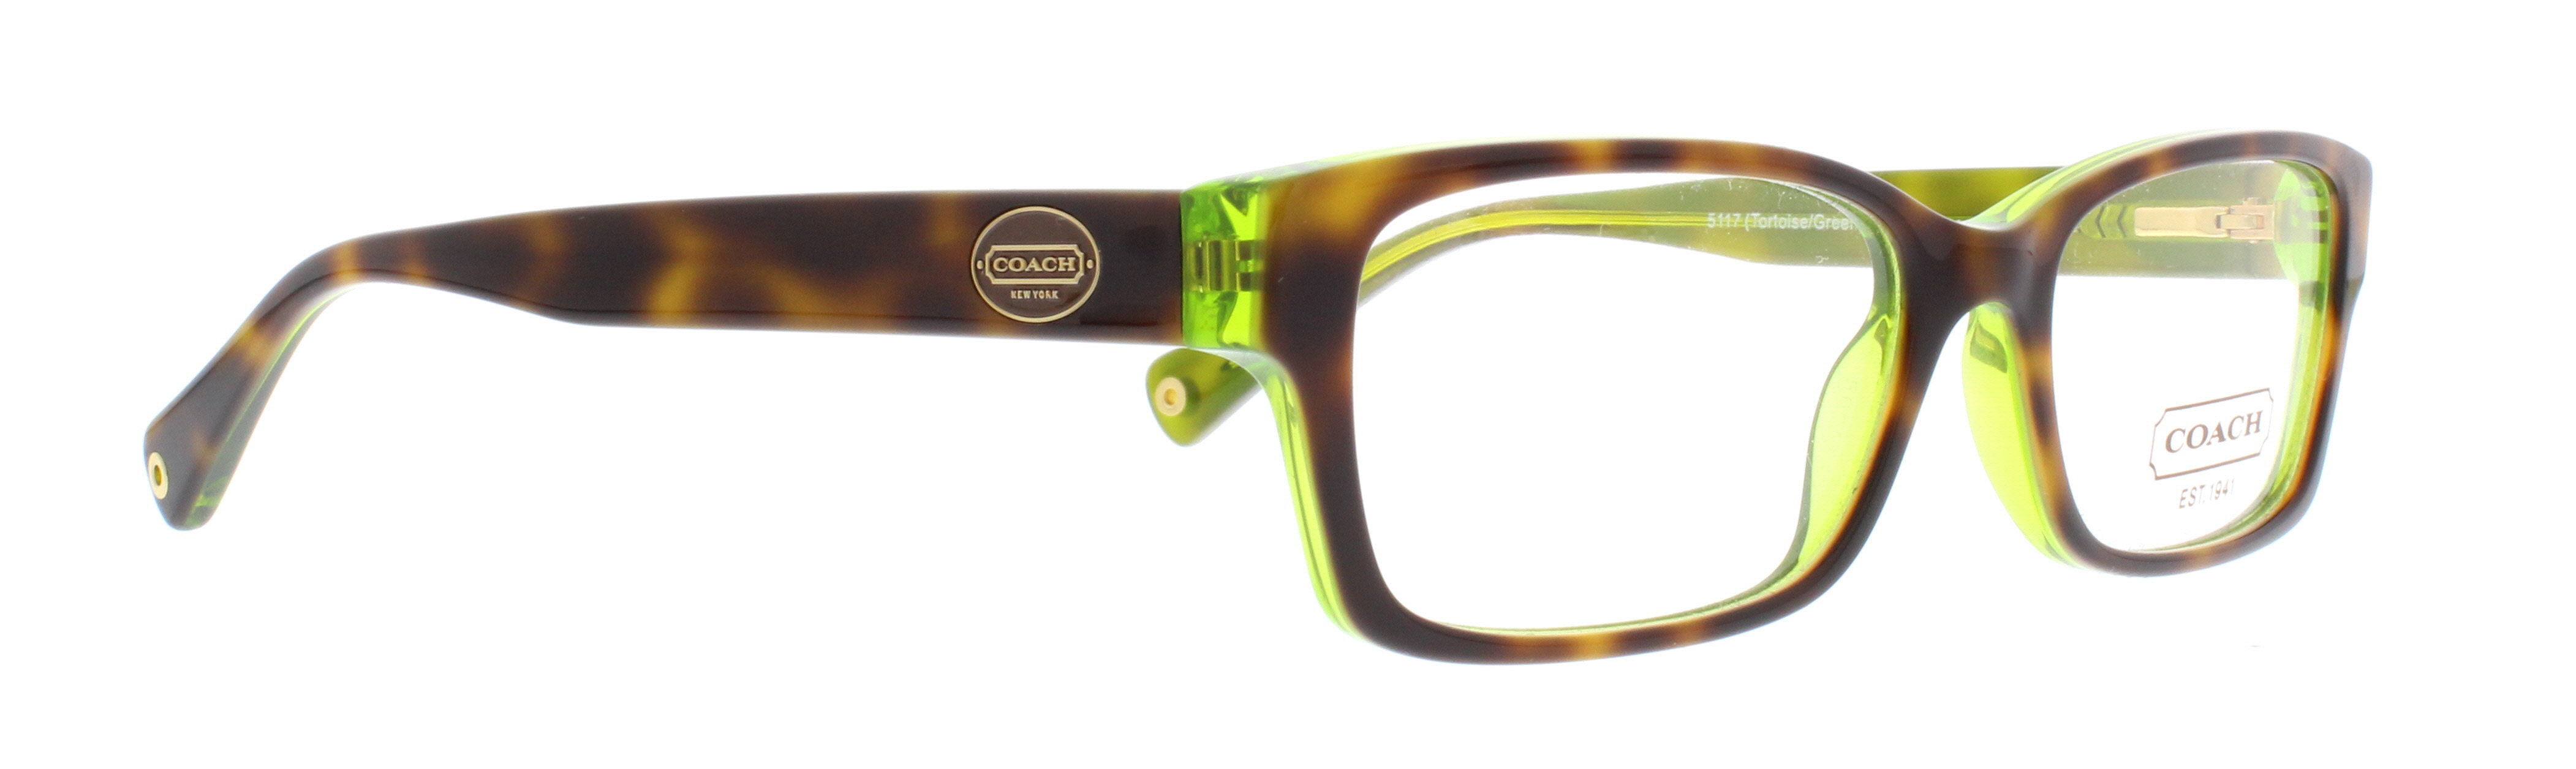 7145a2ce48 COACH Eyeglasses HC 6040 5116 Tortoise Teal 52MM - Walmart.com